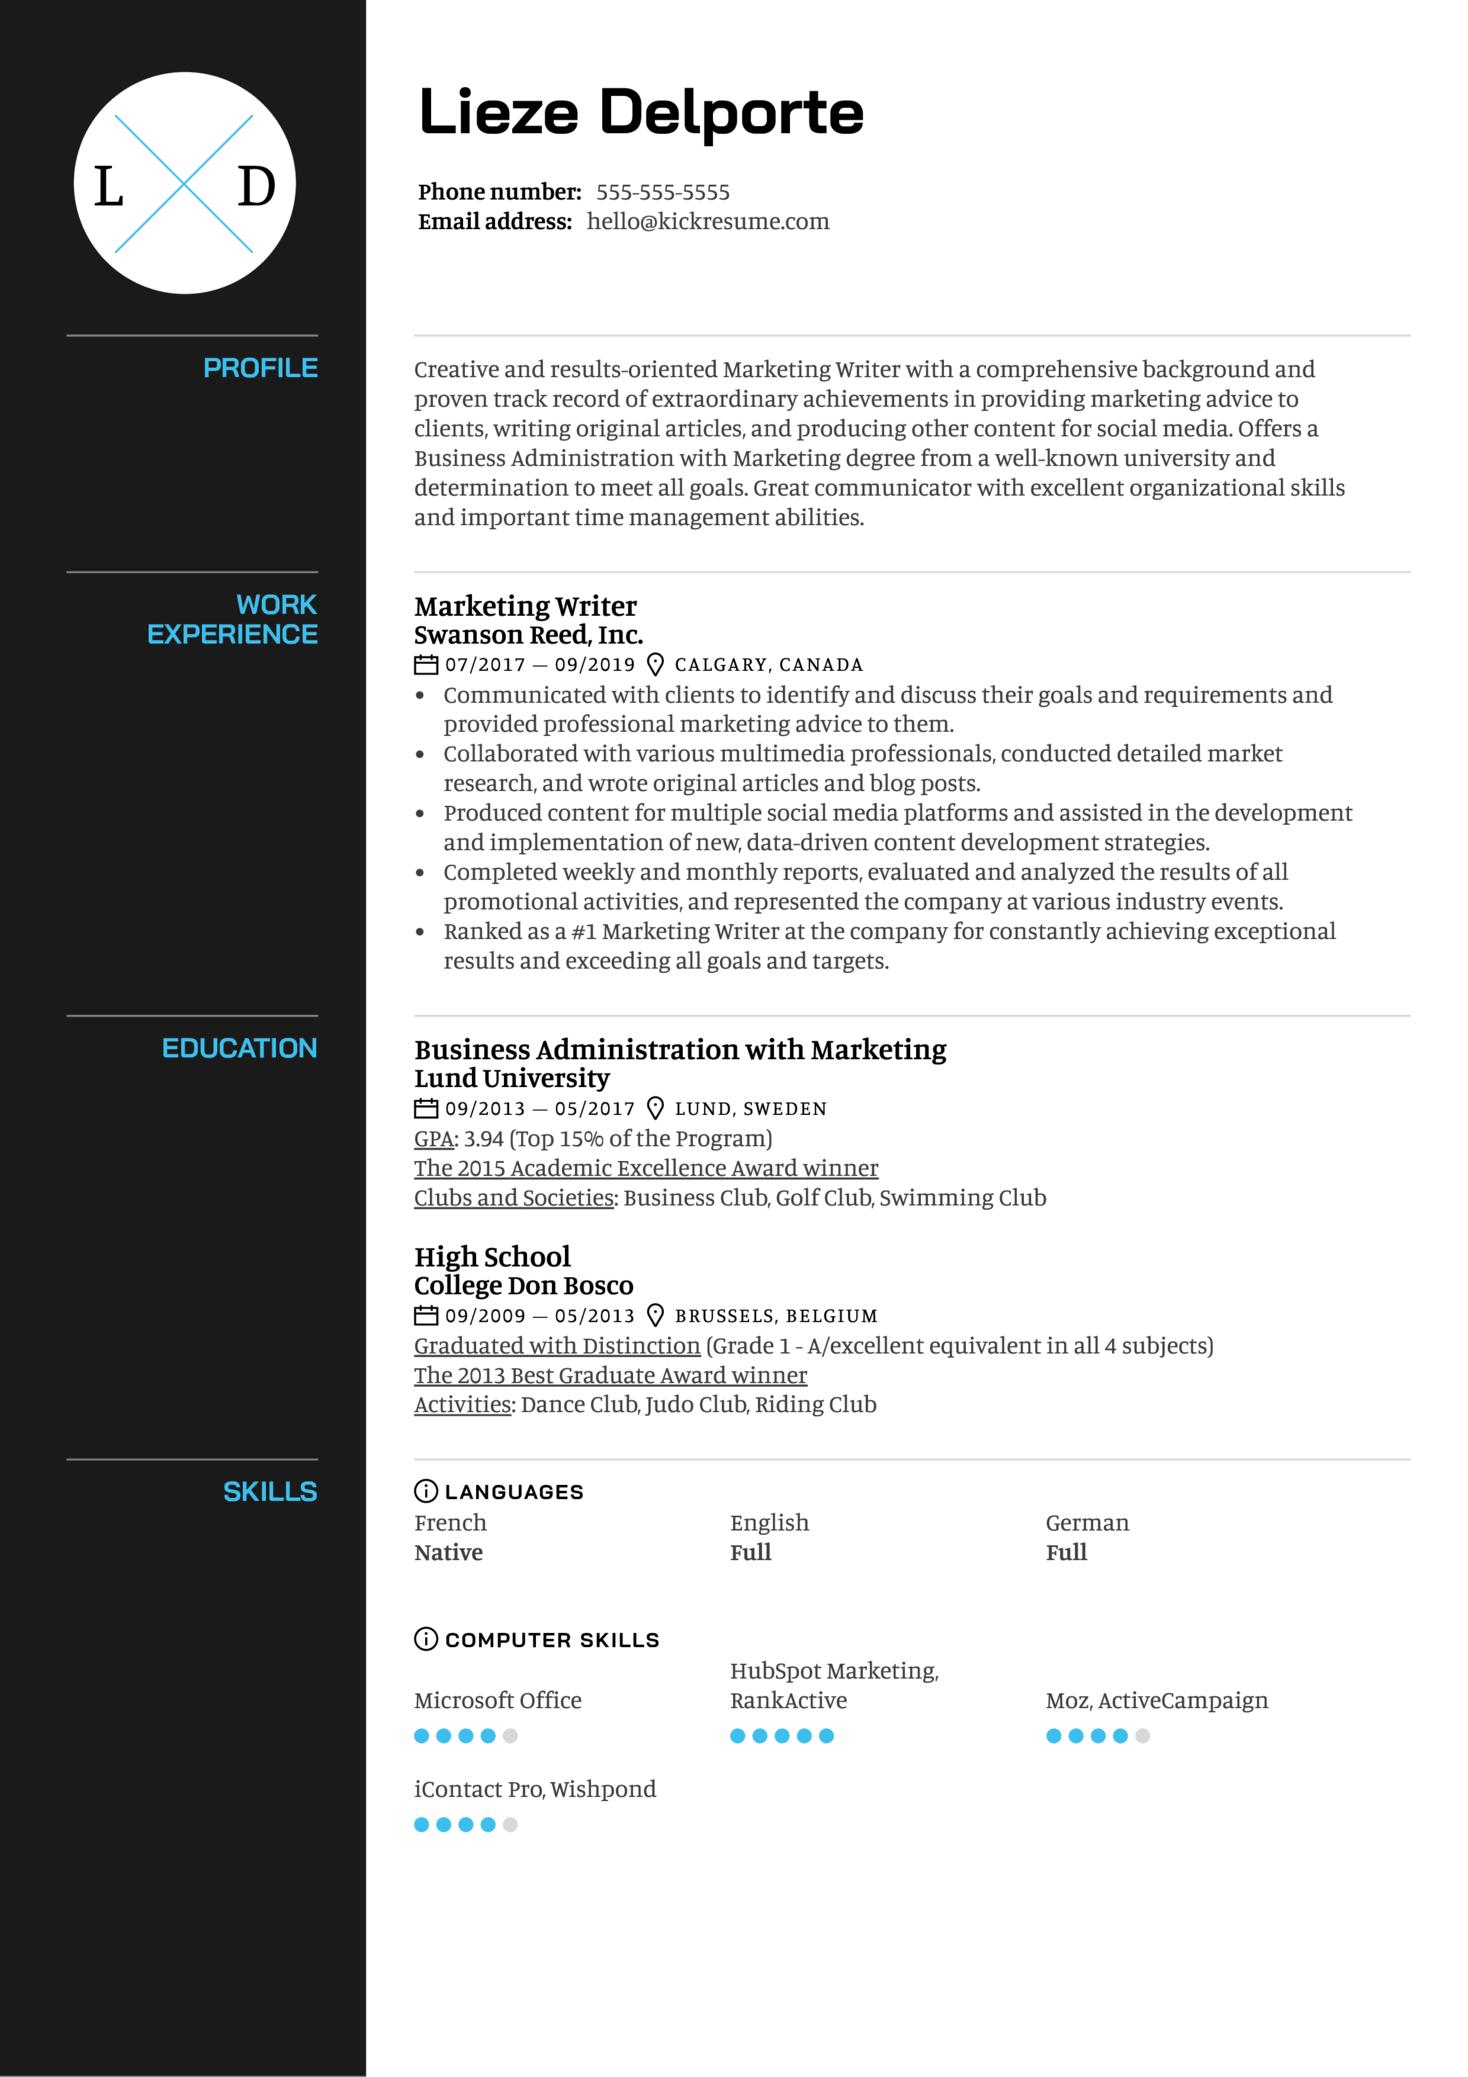 Marketing Writer Resume Sample (Part 1)